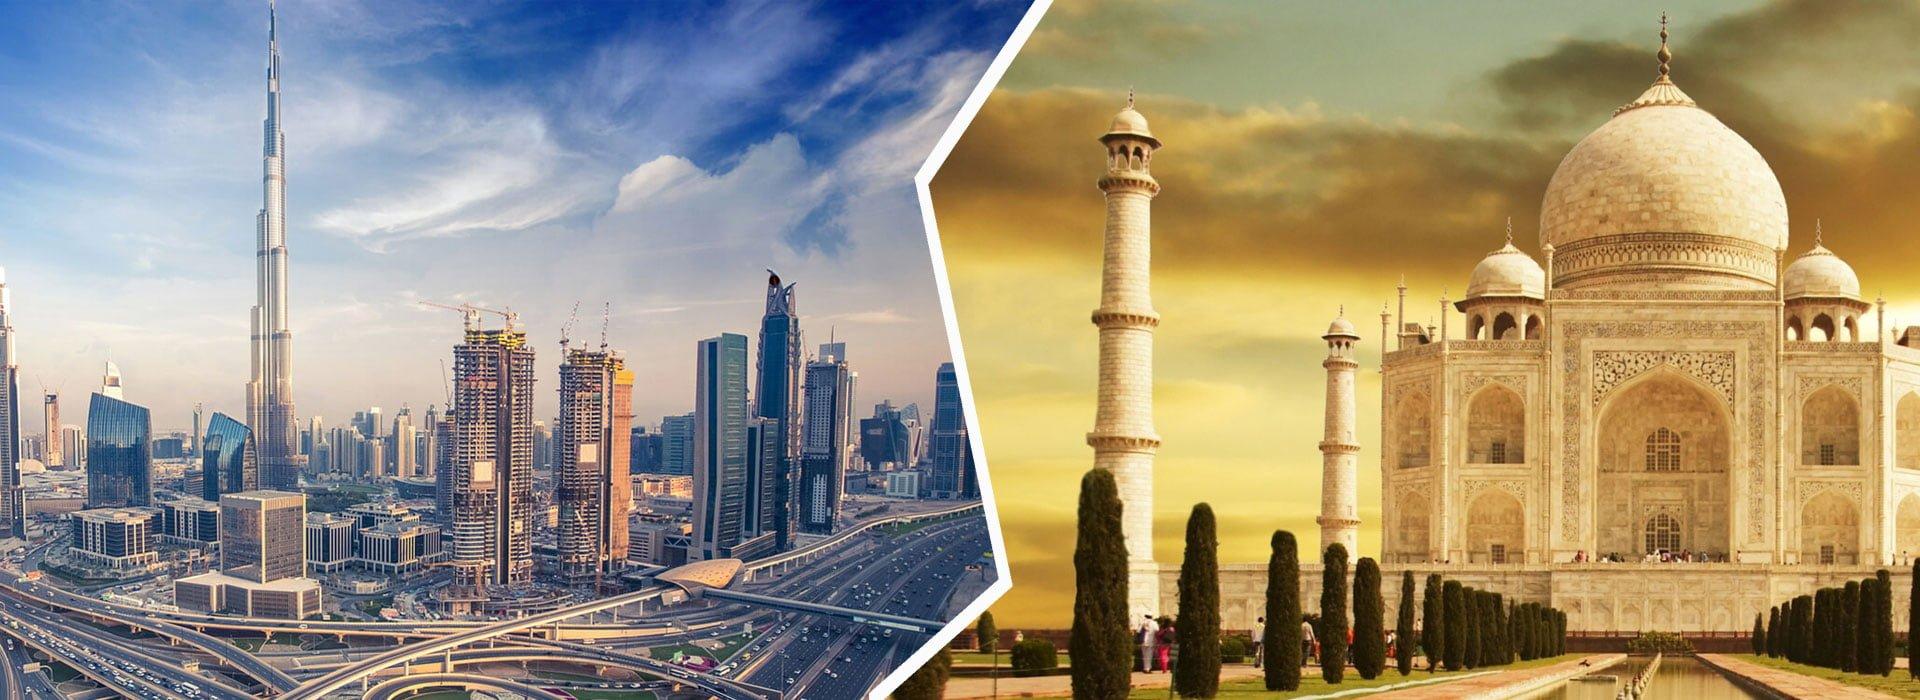 Business Setup in Dubai-Business Link UAE